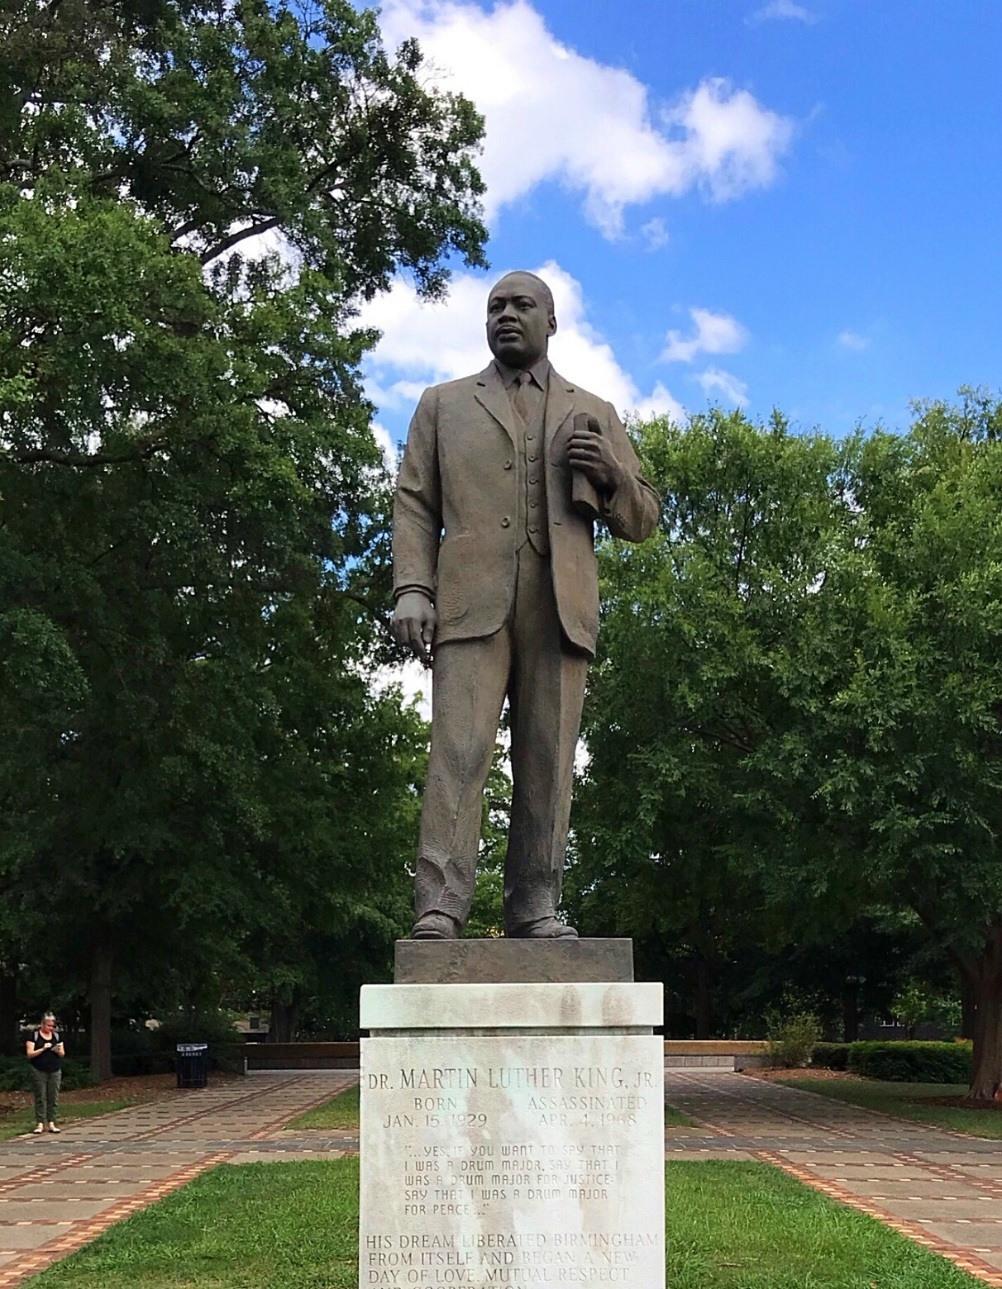 Martin Luther King statue in Kelly Ingram park Birmingham Alabama Photo Heatheronhertravels.com